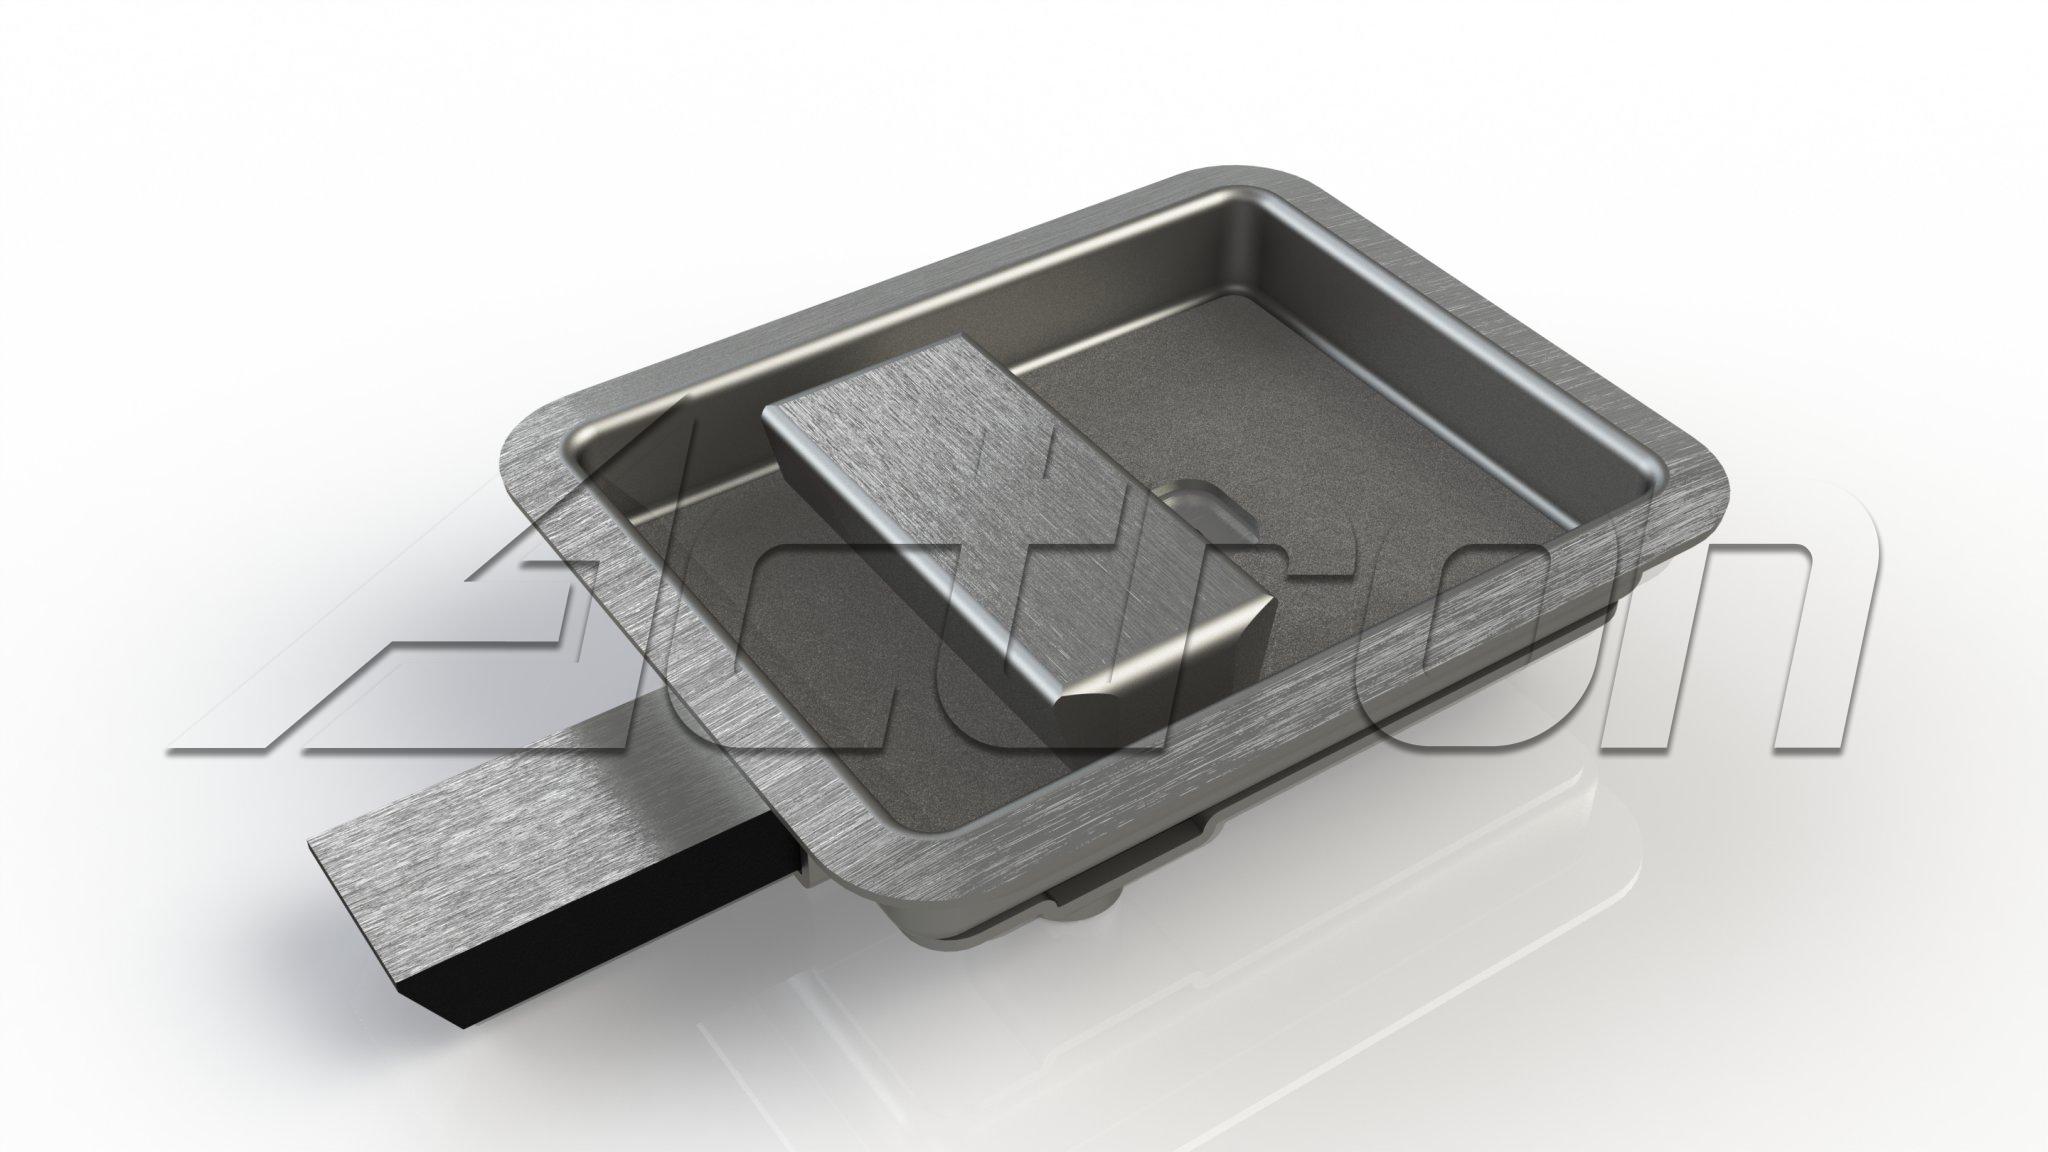 latchlock-assy-8211-sliding-4490-a27044.jpg